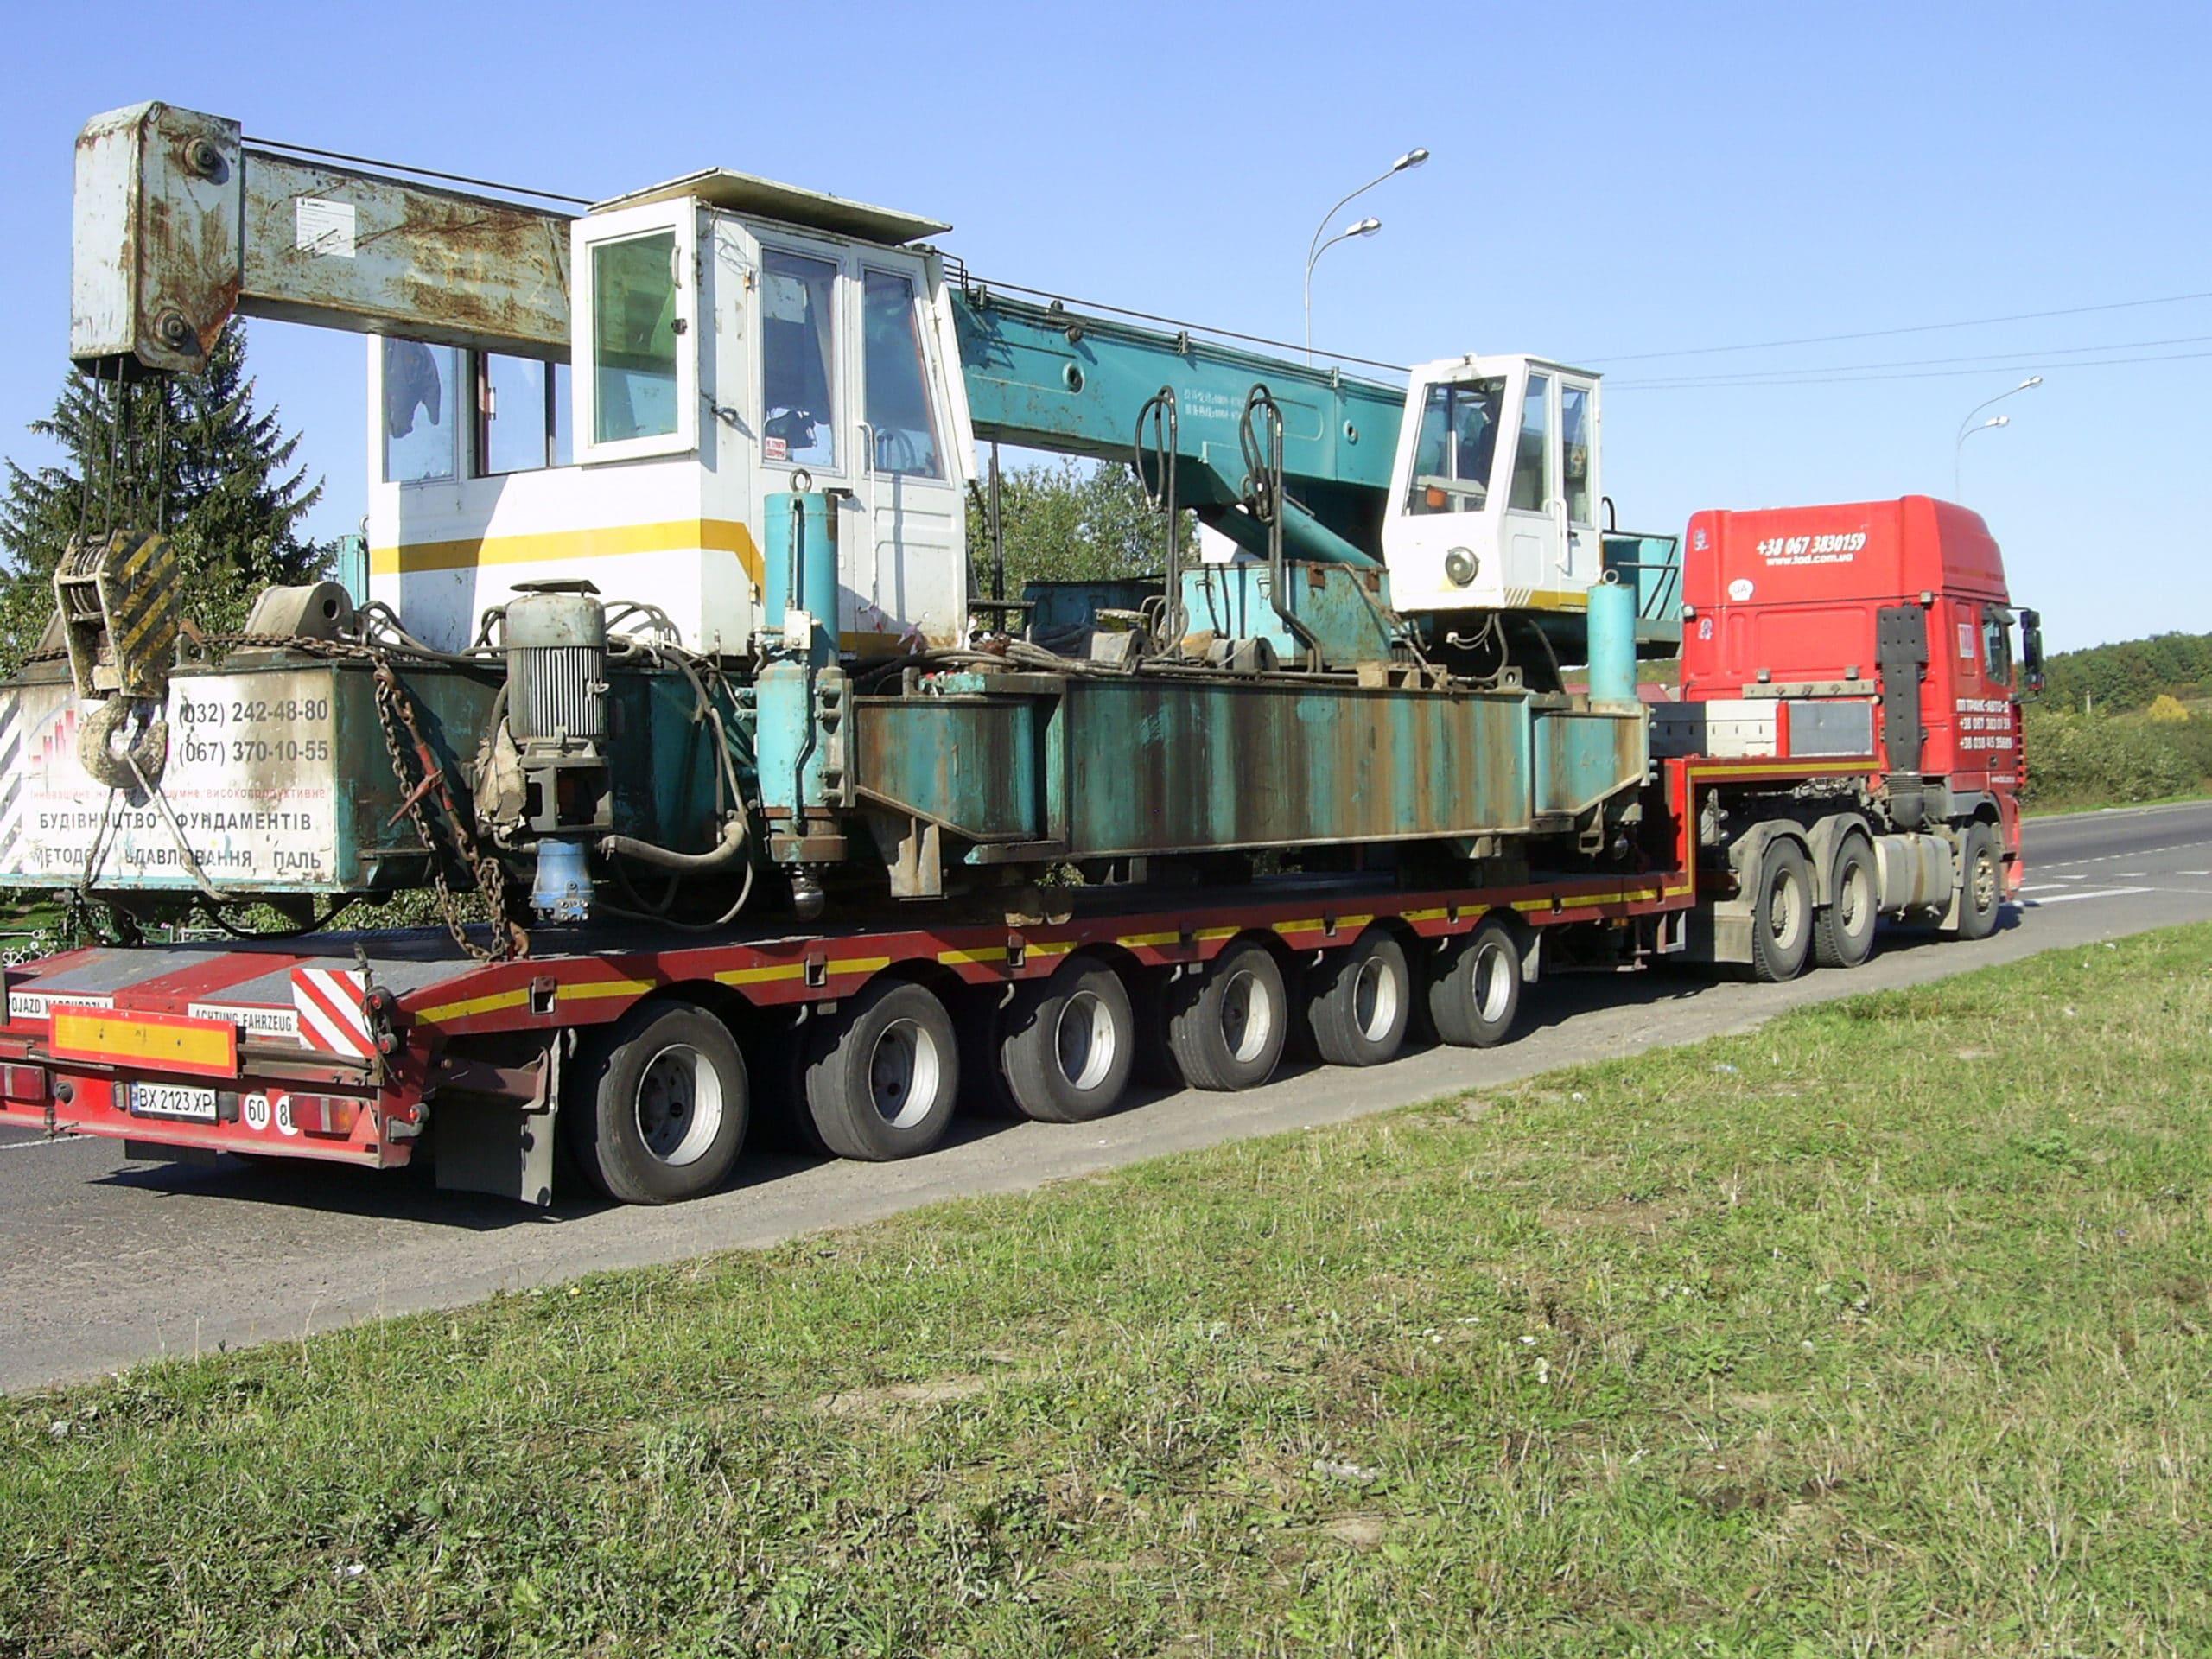 Перевозки железнодорожного крана